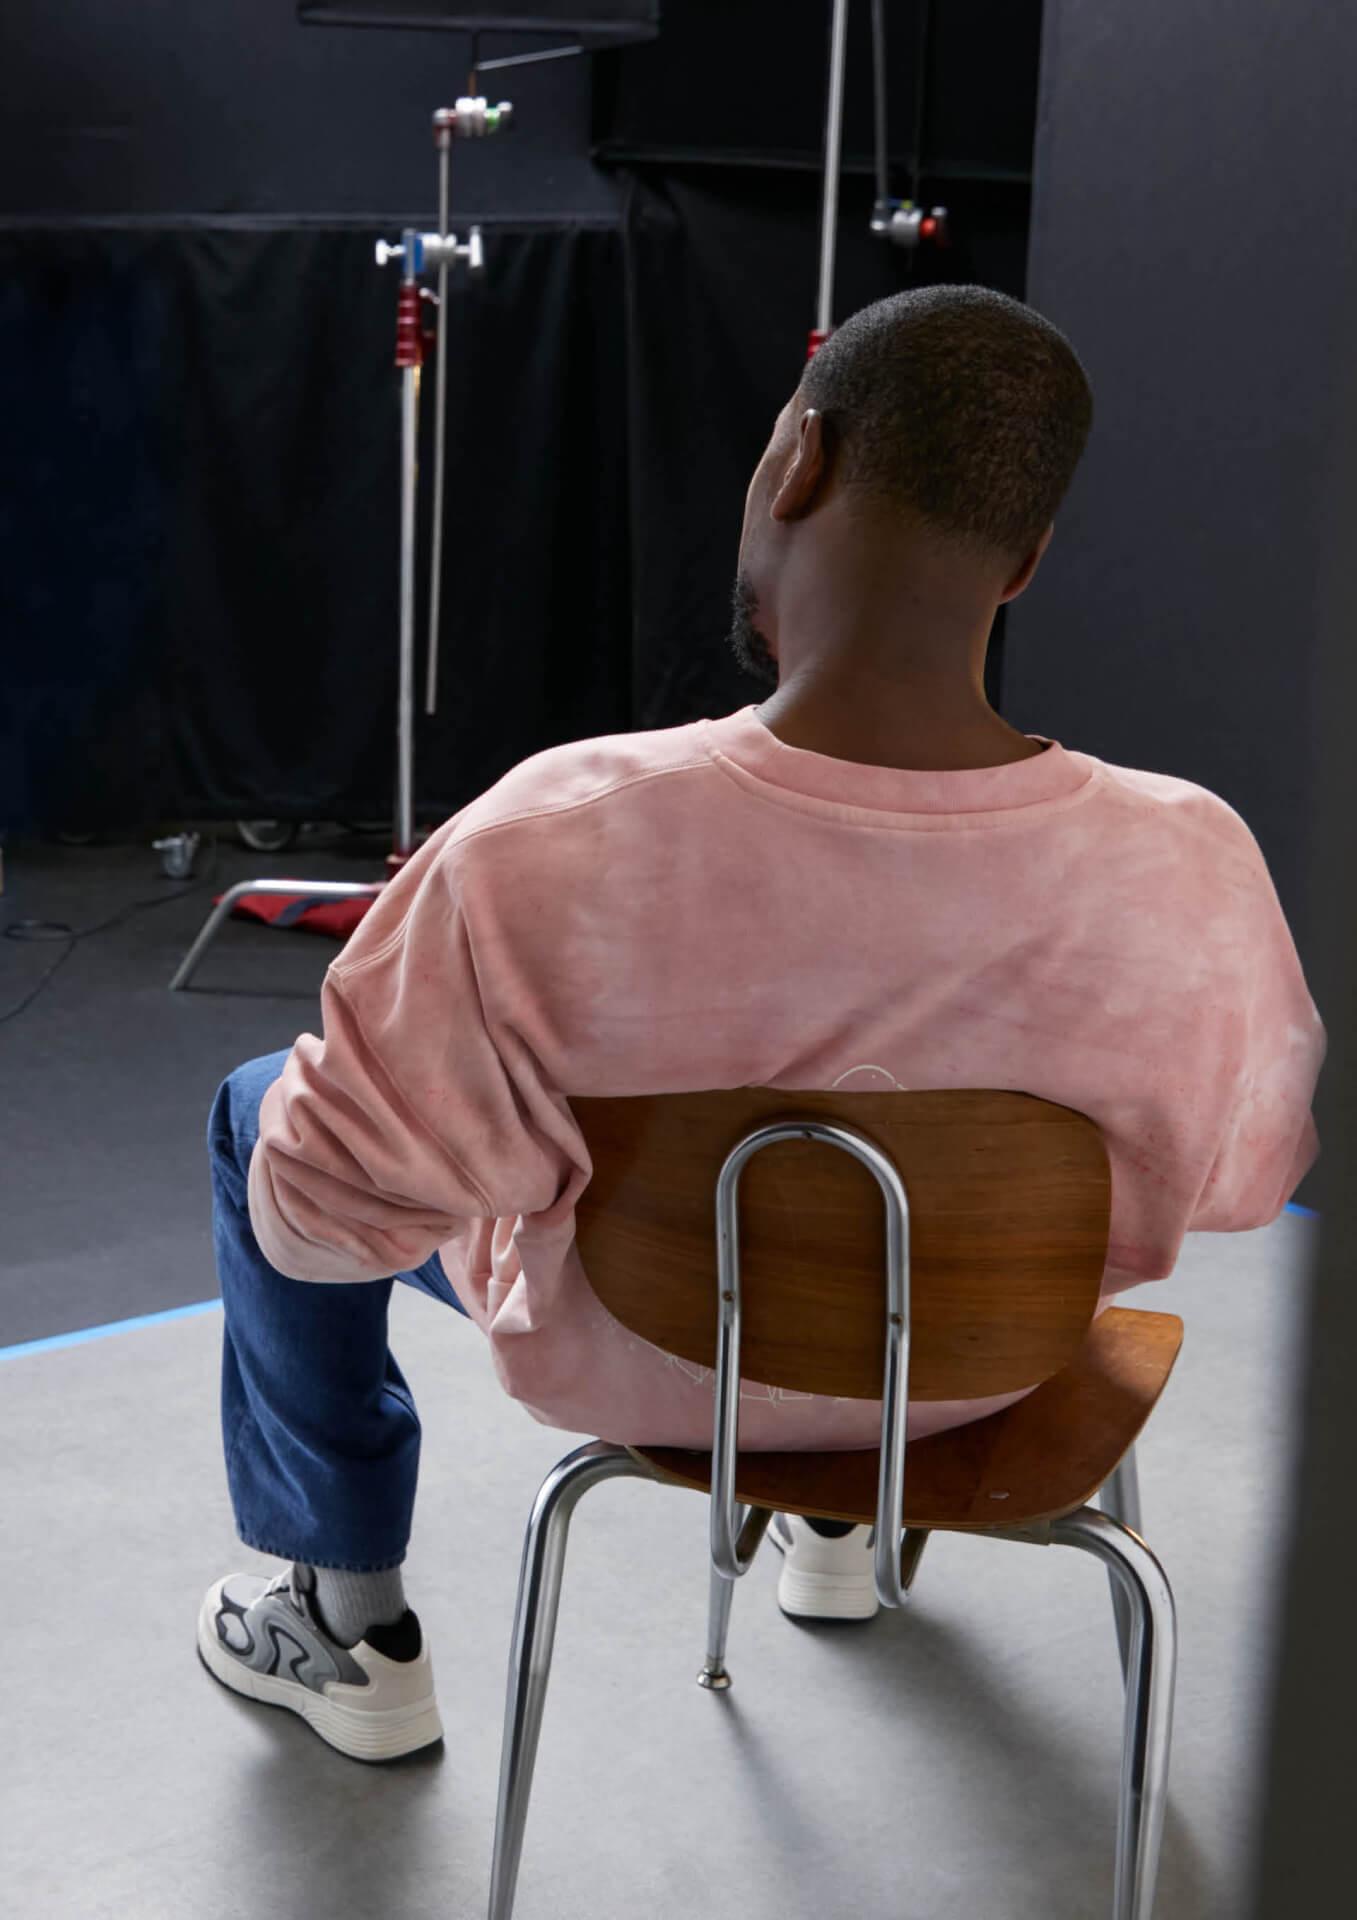 H&Mが俳優のジョン・ボイエガとタッグを組んだメンズウェアコレクションを発表!リサイクル素材、オーガニック素材を使用したアイテムが登場 life211006_handm_john_boyega_05